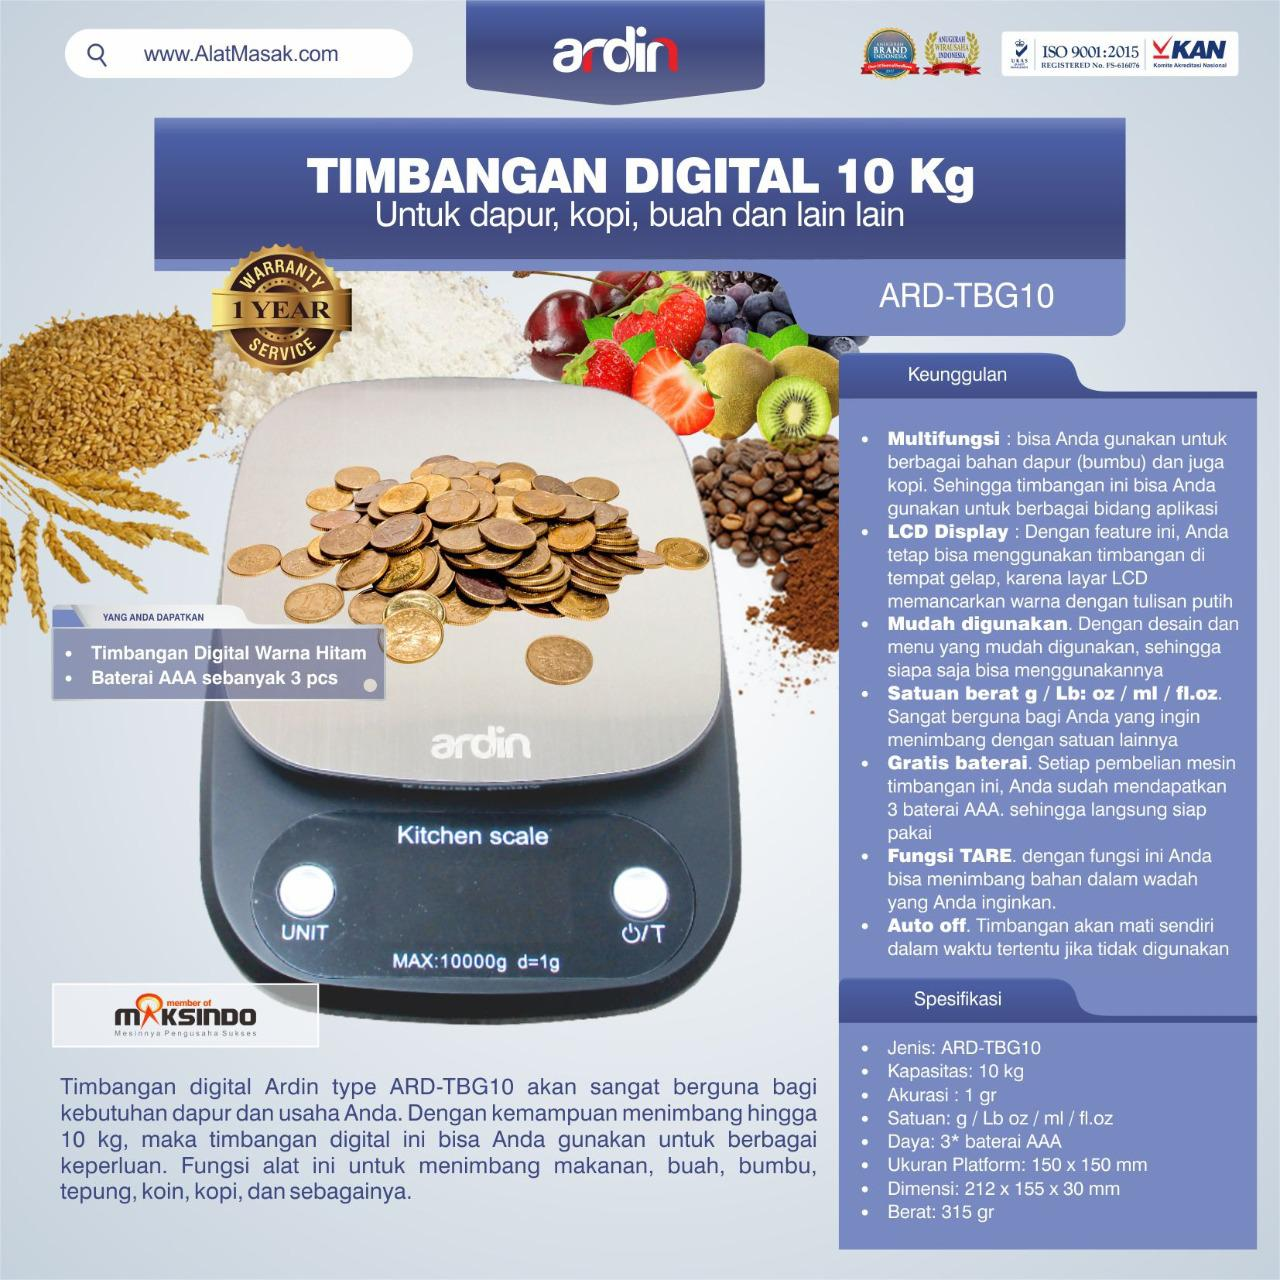 Jual Timbangan Digital 10 kg / Timbangan Kopi ARD-TBG10 di Semarang